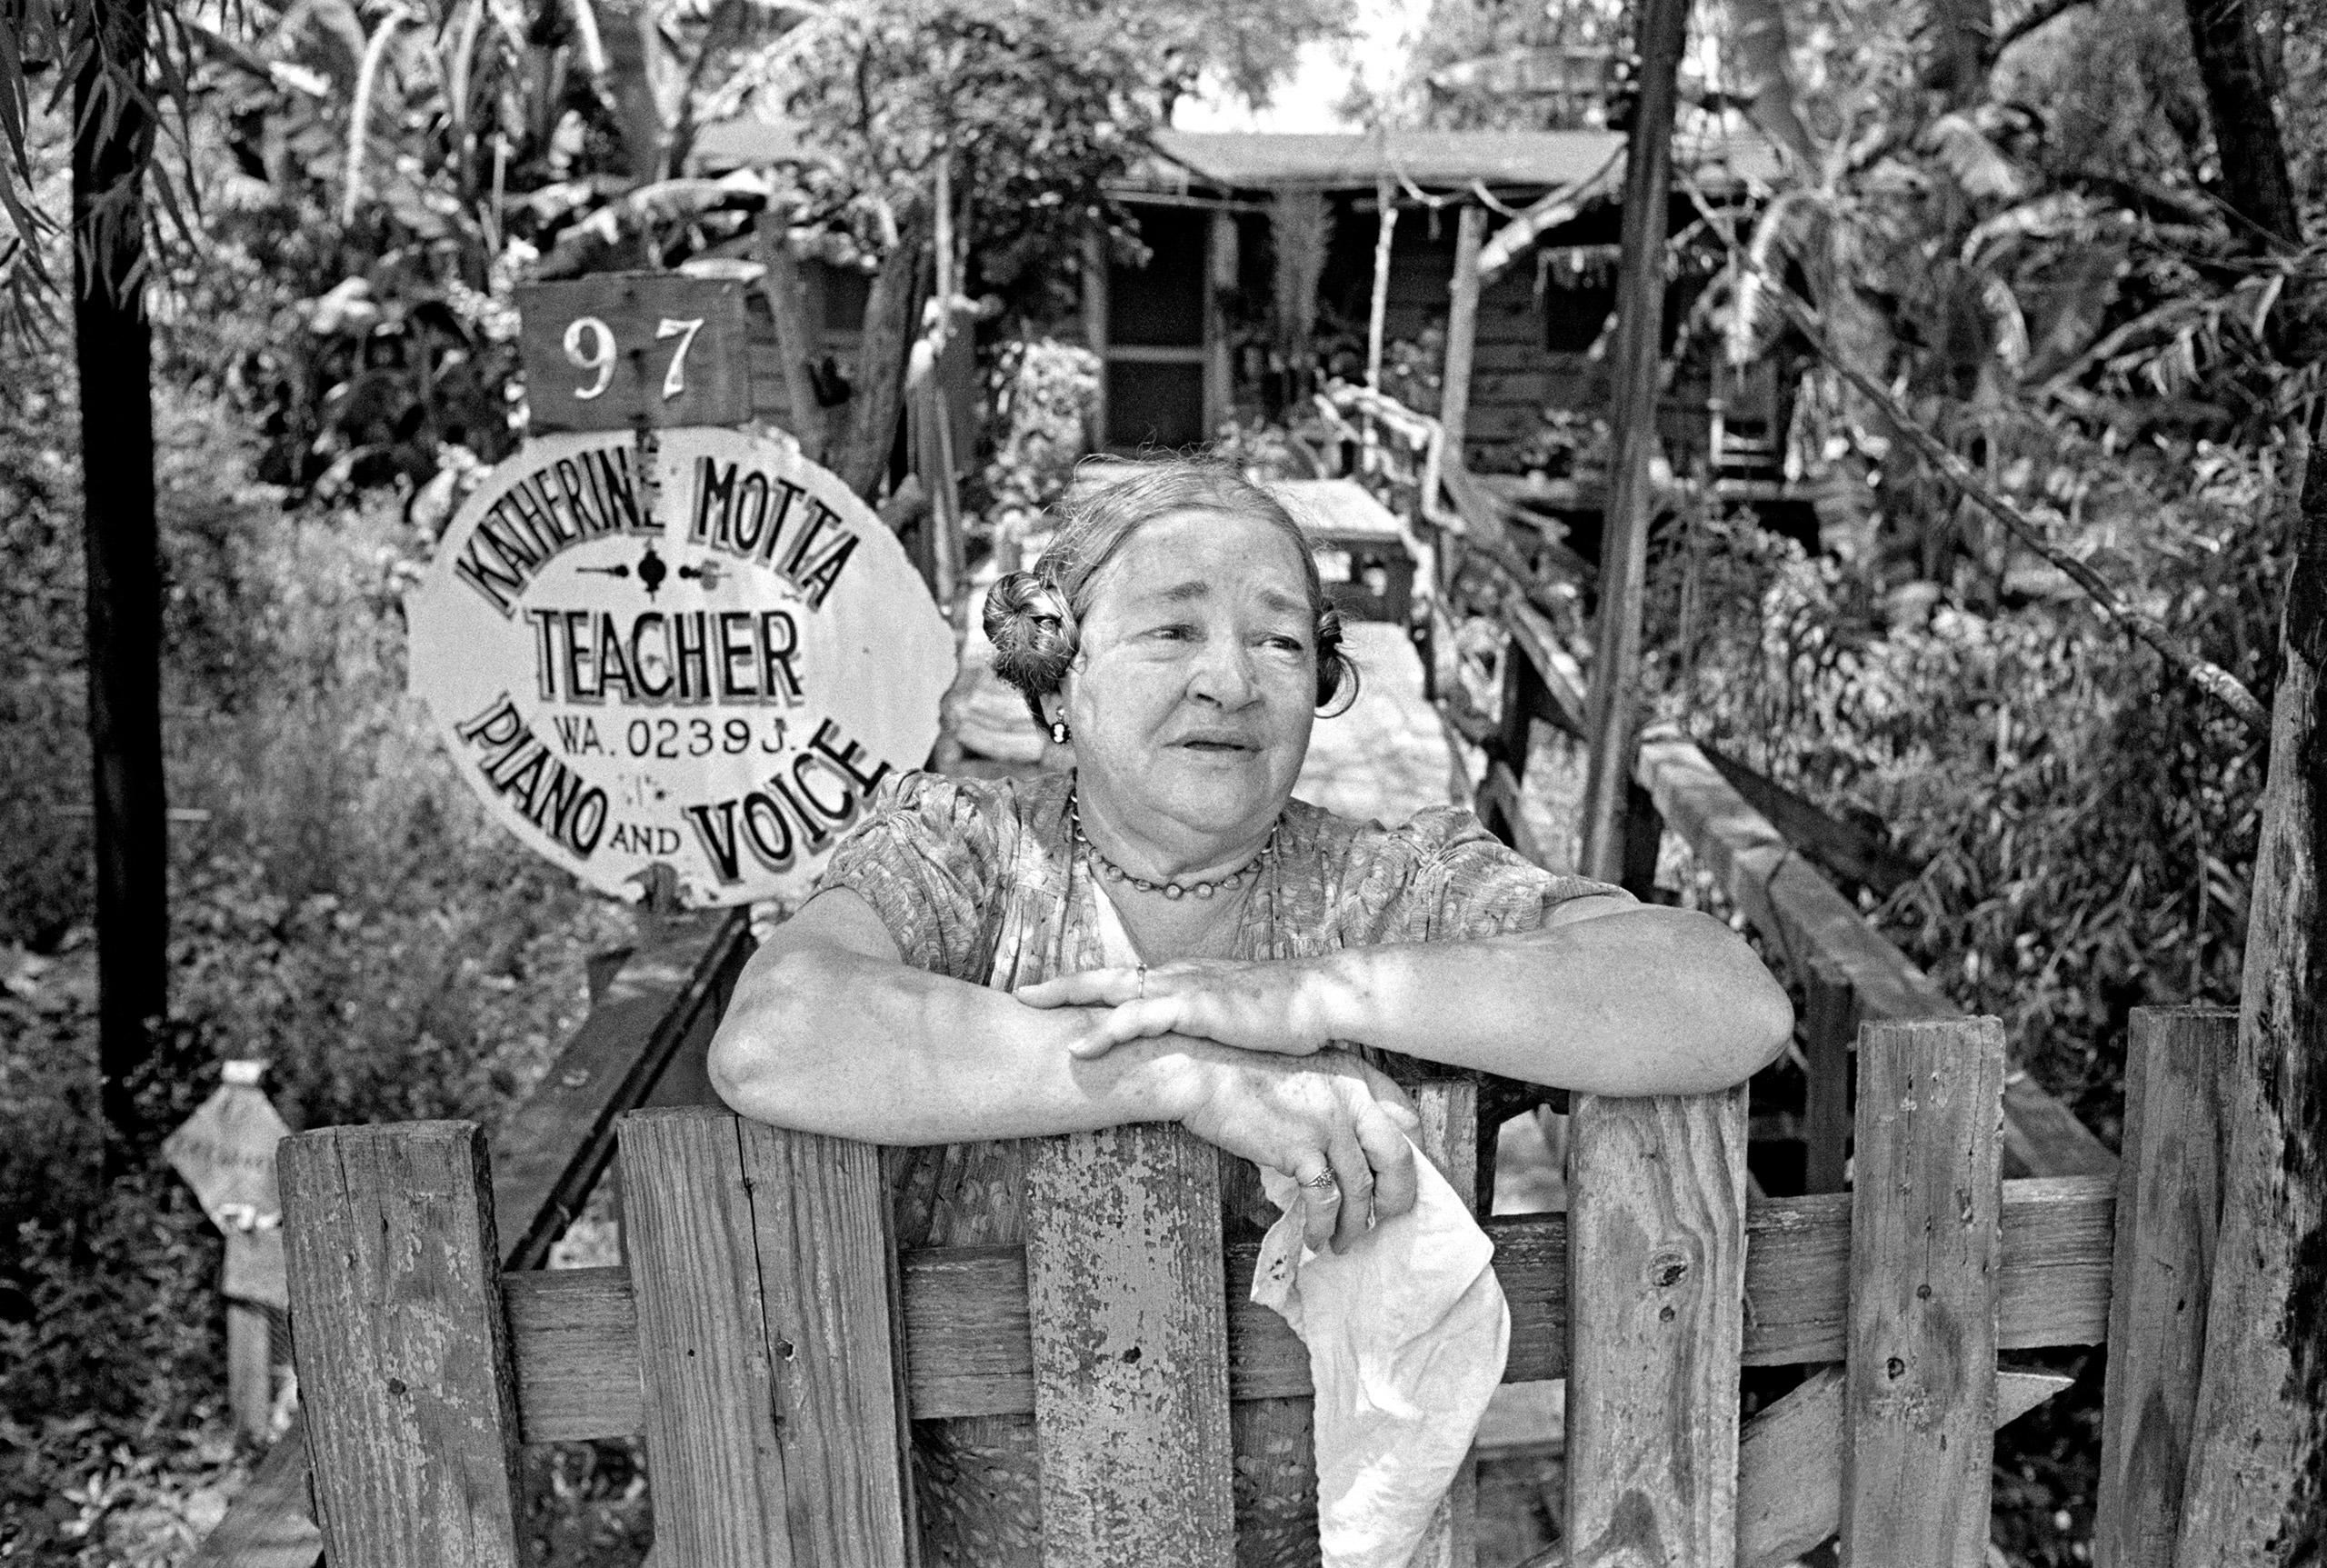 Music Teacher, Batture community, New Orleans, 1953.